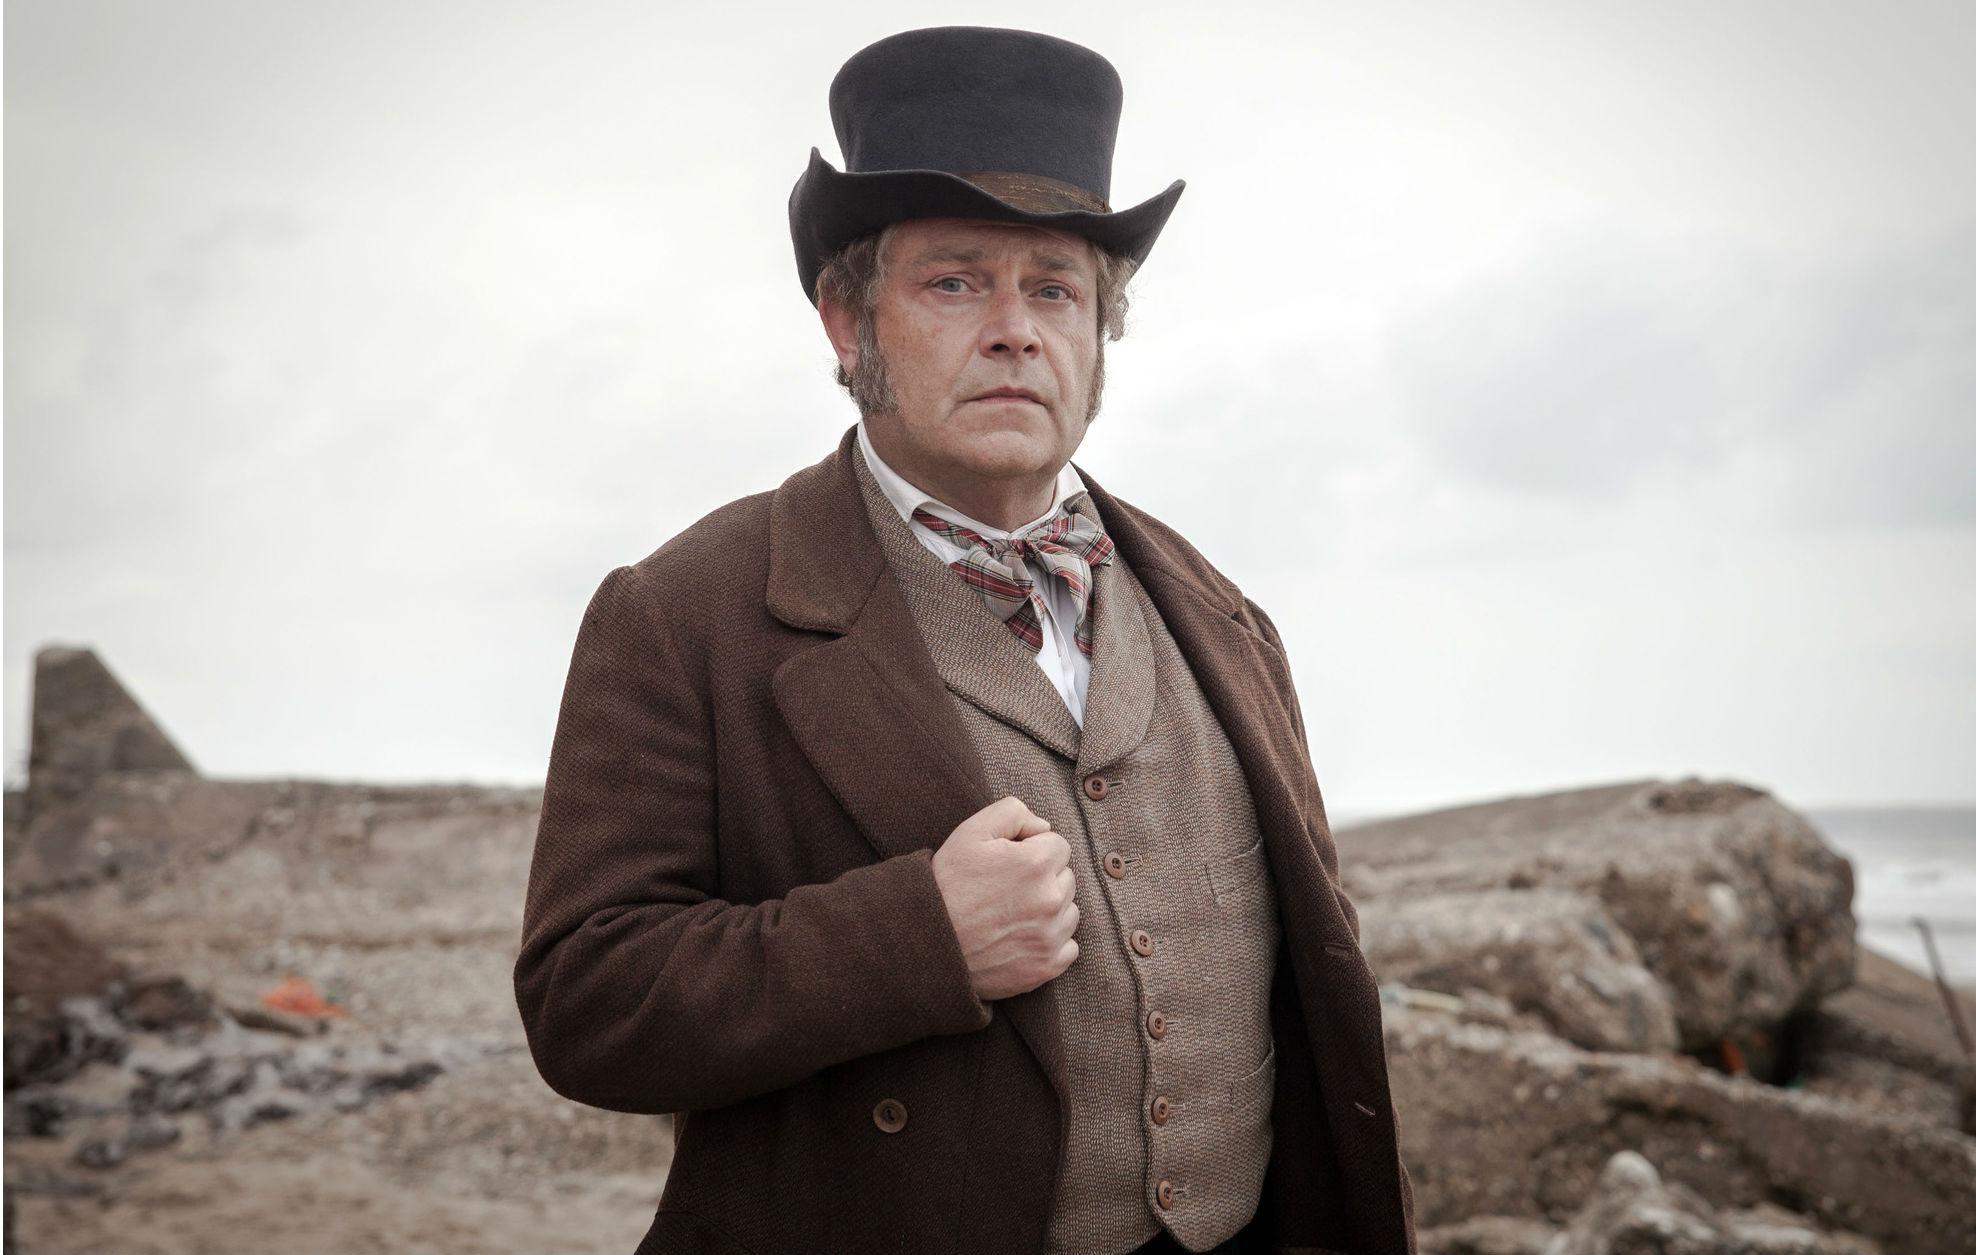 John Thomson wants to play Bond villain